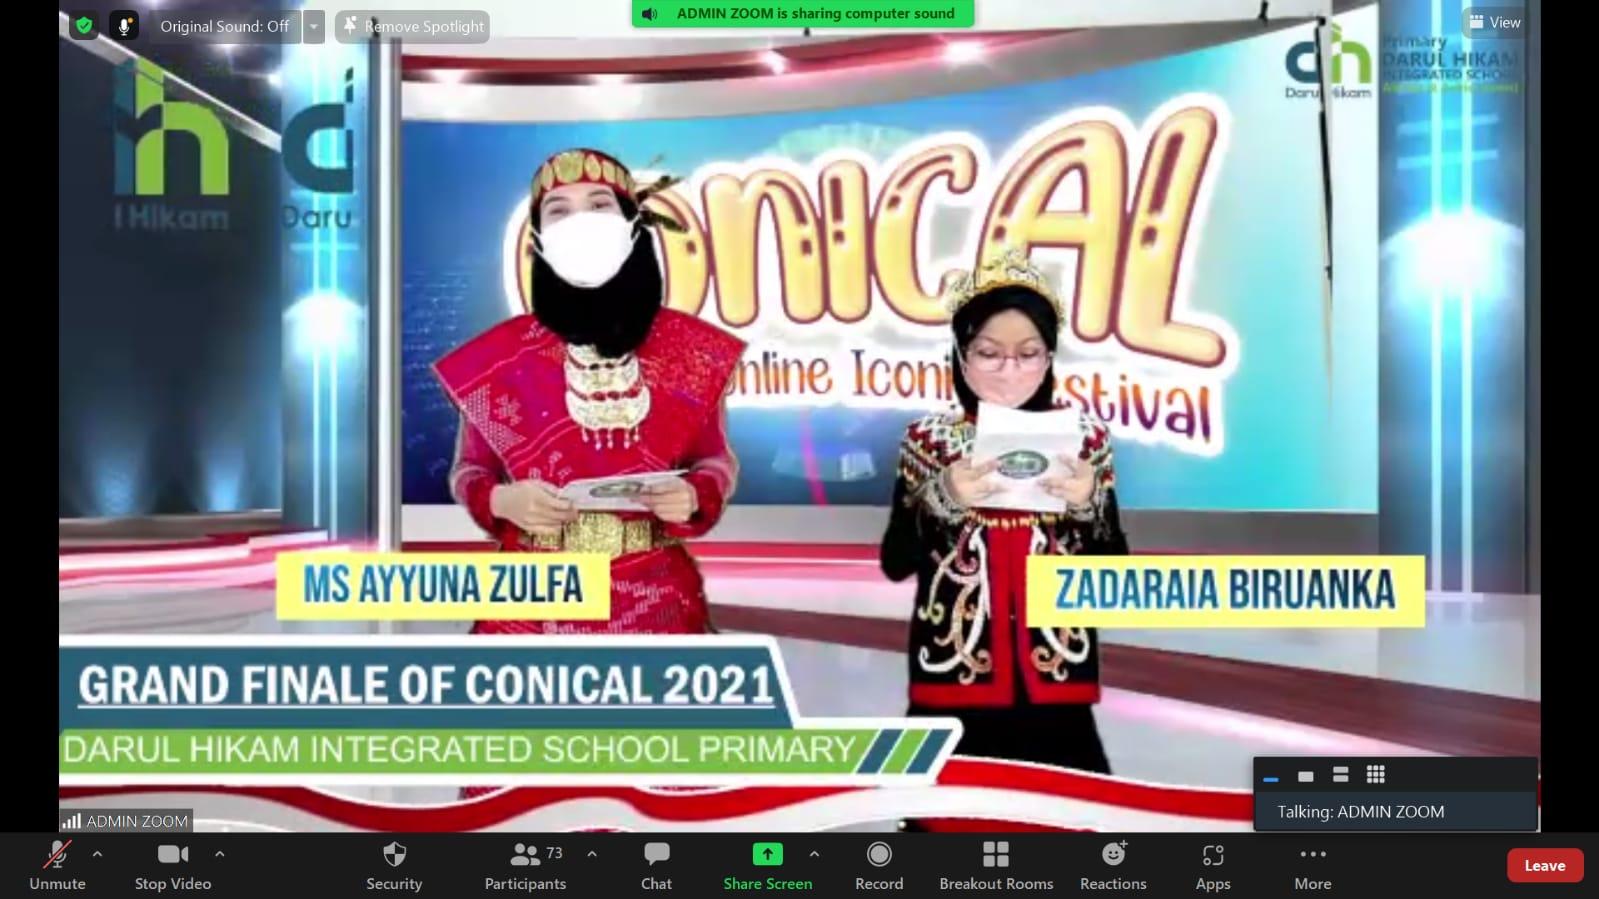 210925113844-conic.jpg